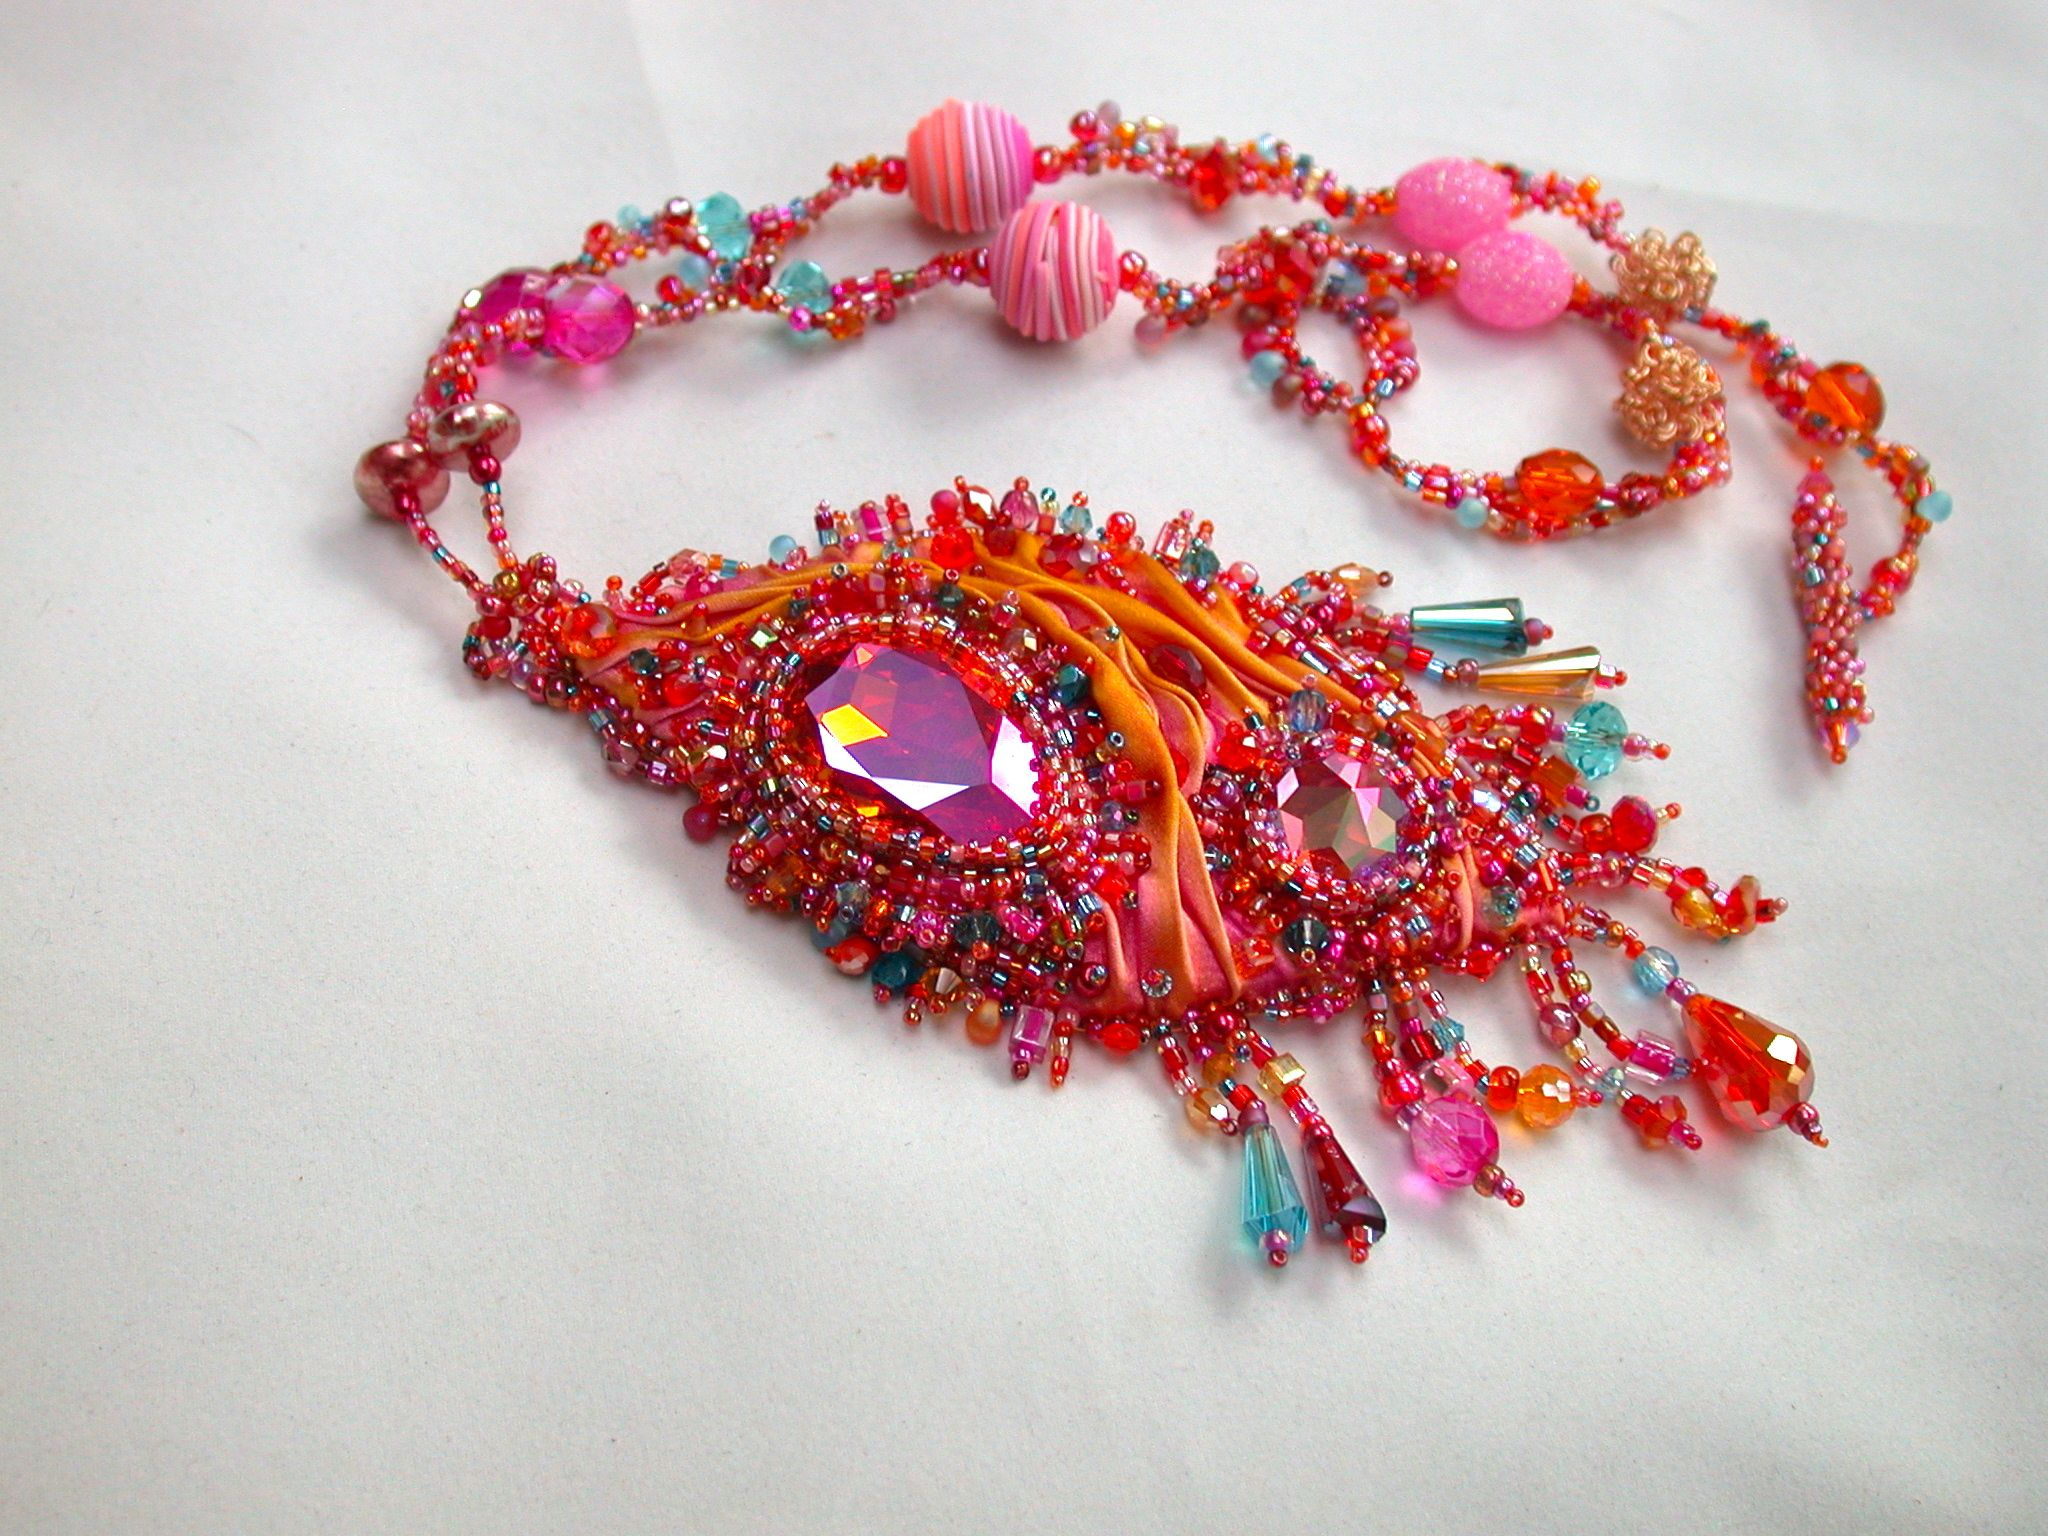 'Phoenix Tears' Companion piece to the Firebird Bracelet. Commissioned, sold